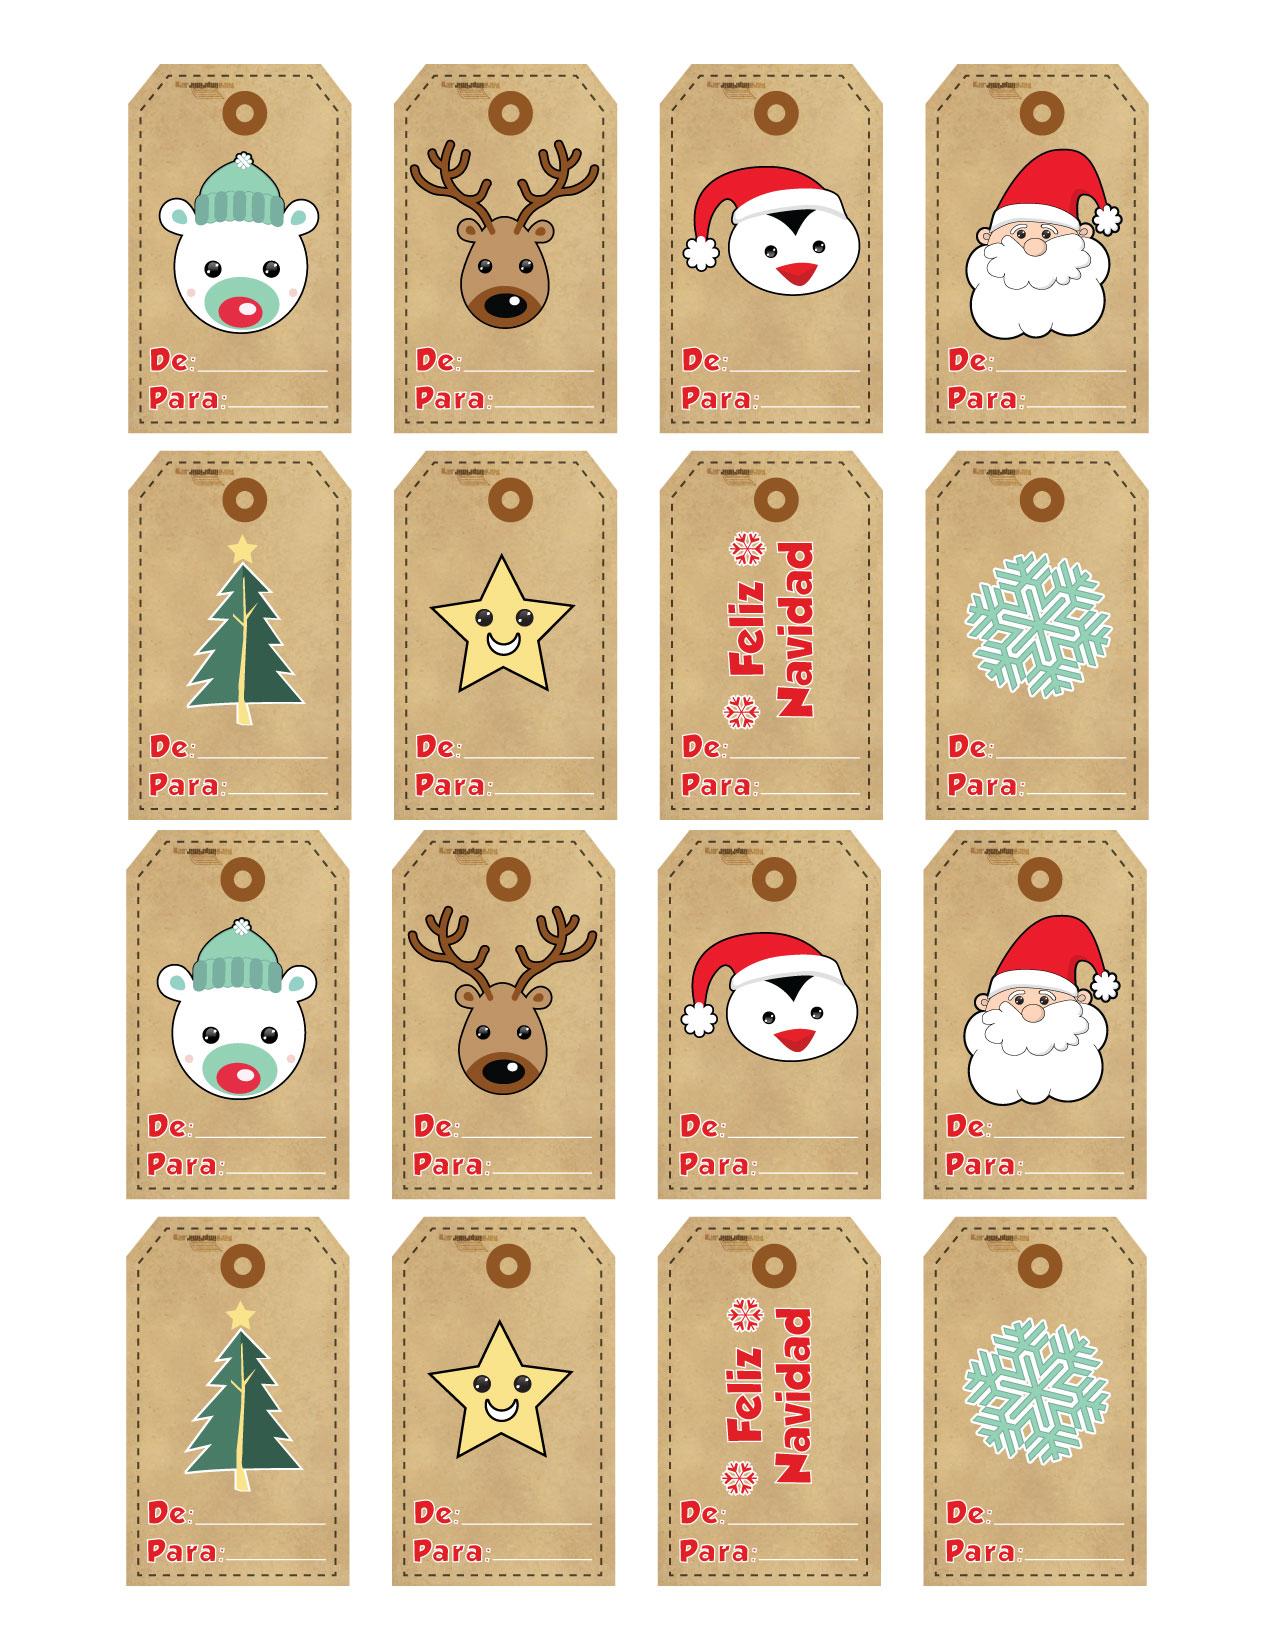 Imagenes De Motivos Navidenos Para Imprimir.Etiquetas Navidad Para Imprimir